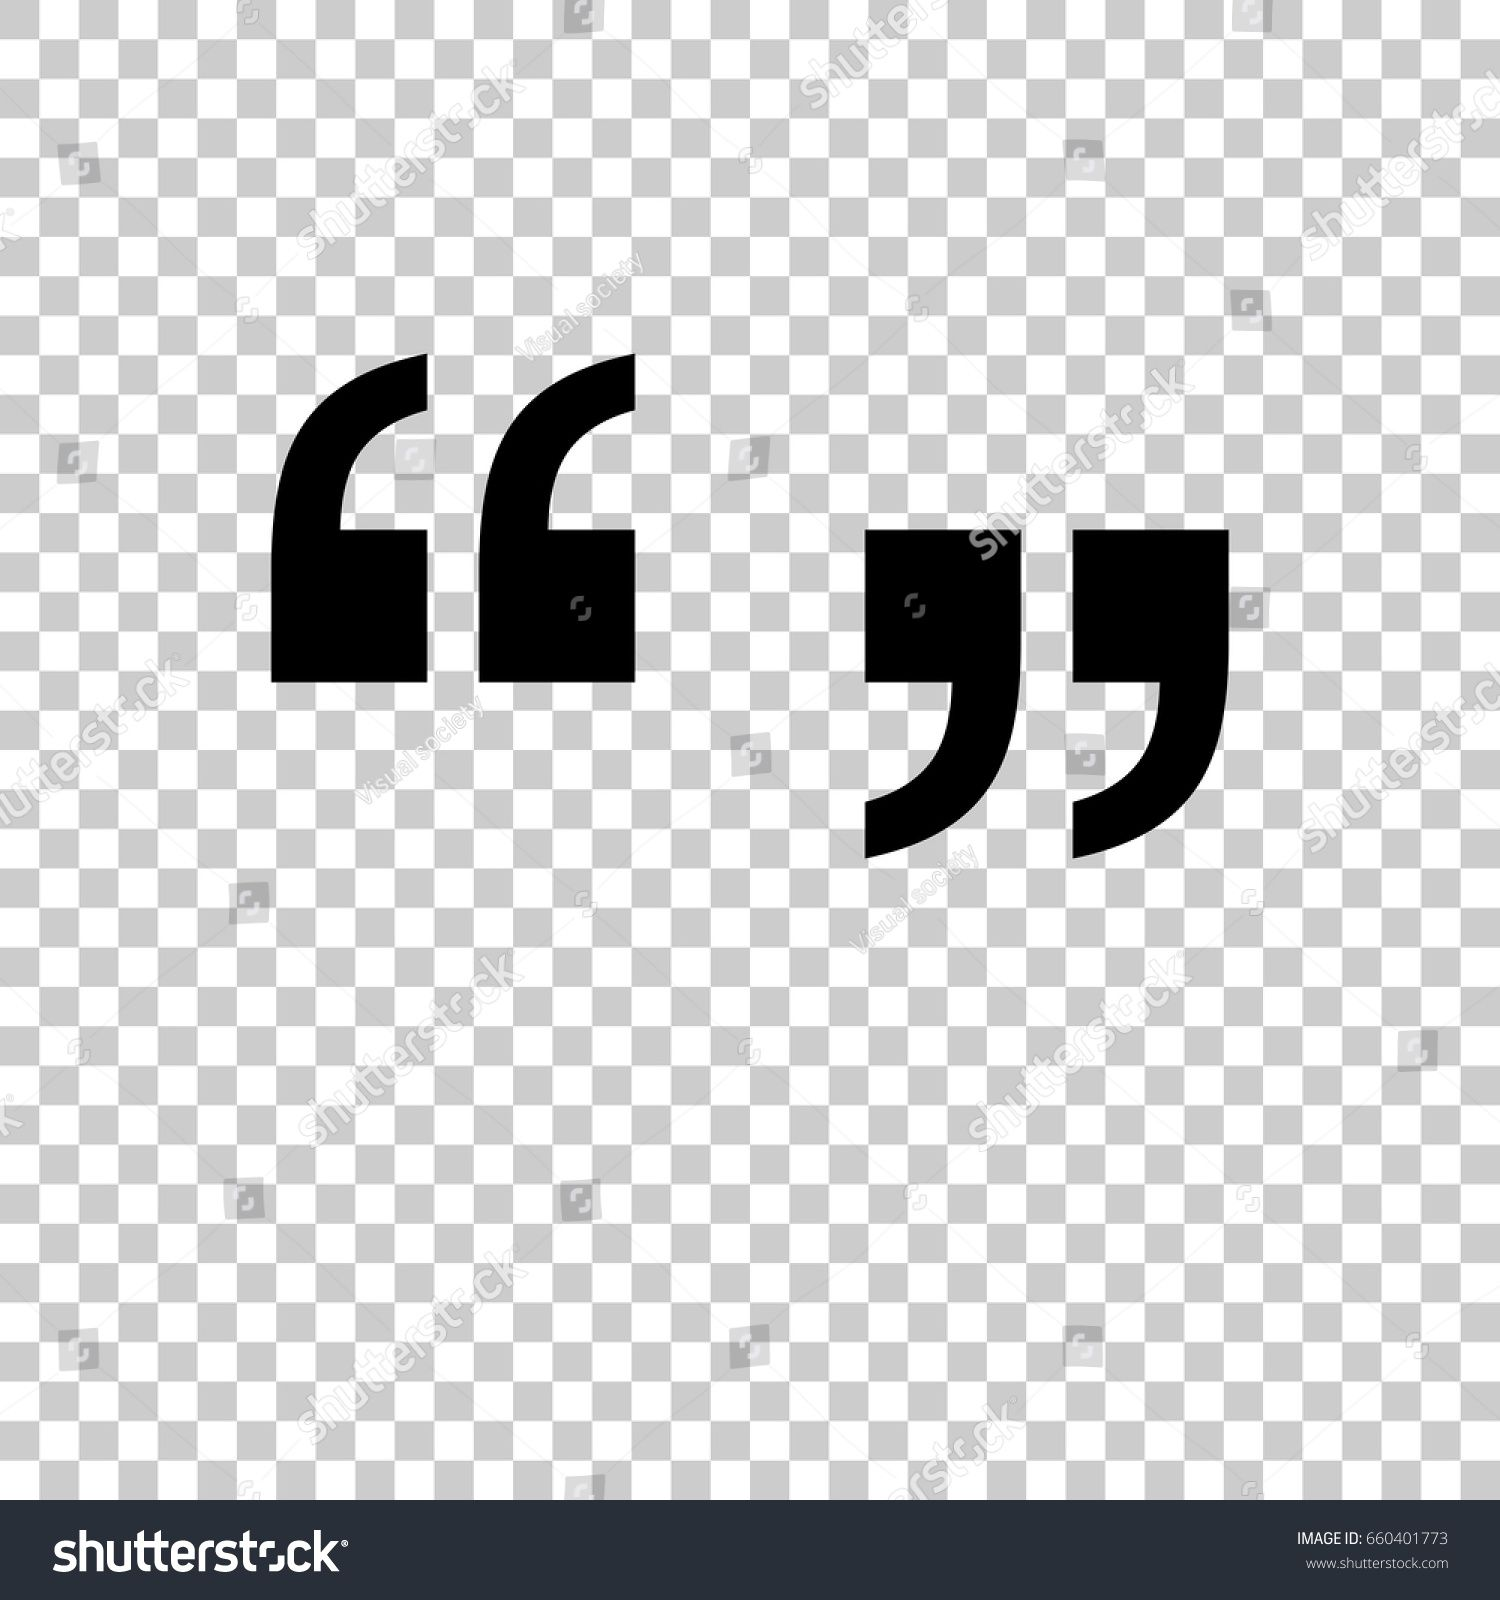 Quotation Marks Symbol Isolated On Transparent Background